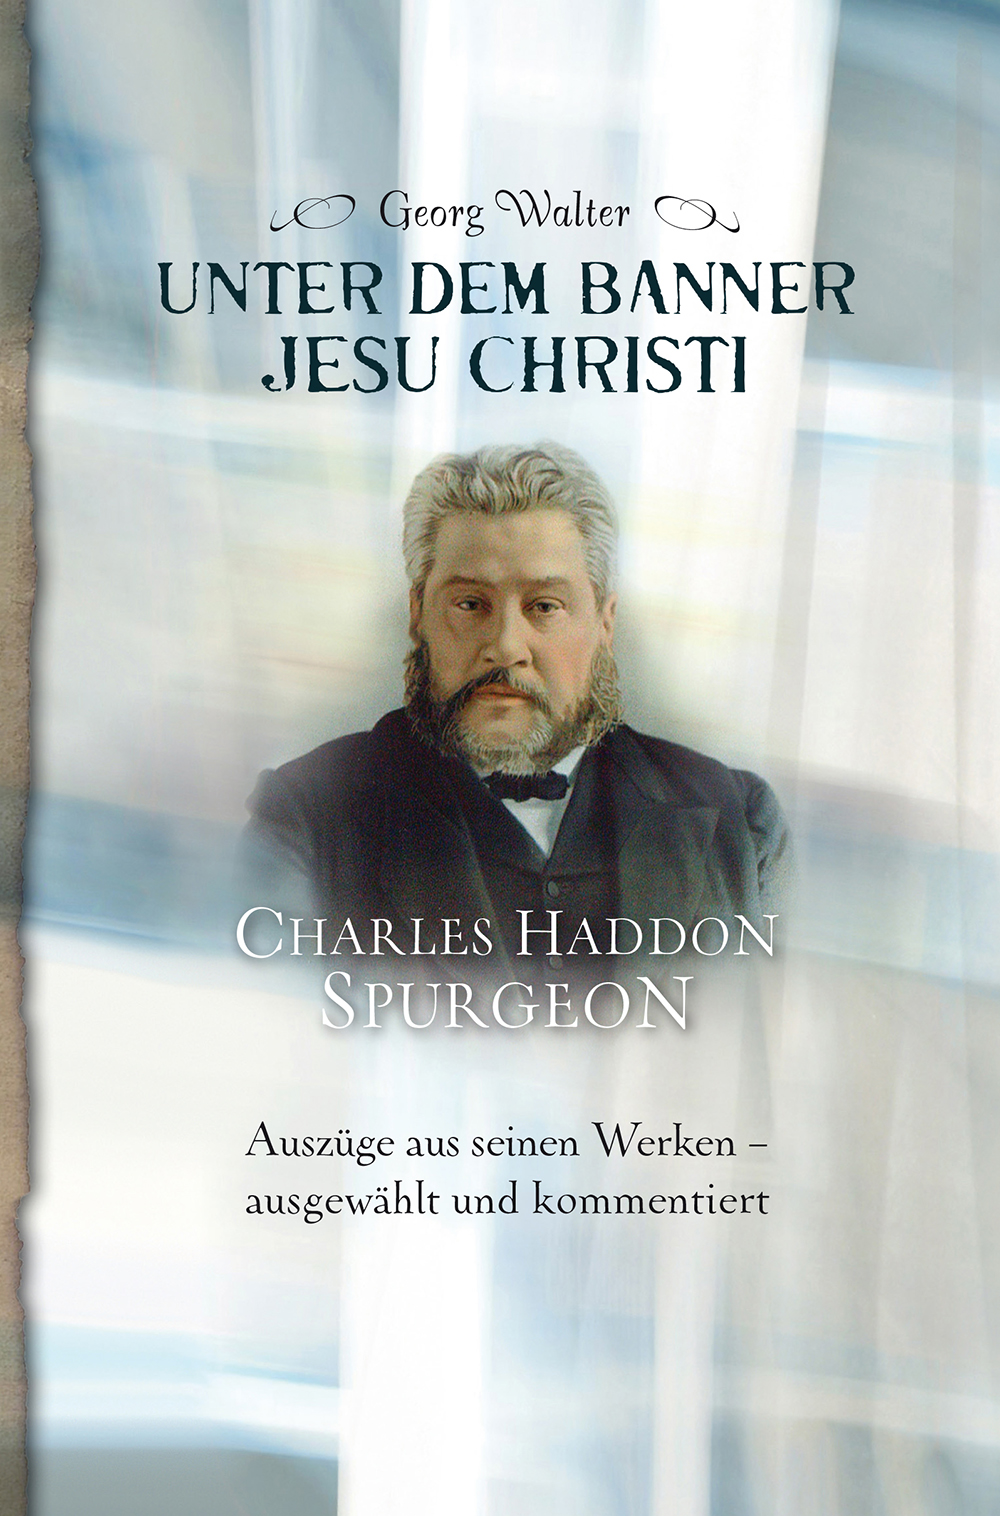 CLV_unter-dem-banner-jesu-christi_georg-walter_256243_1